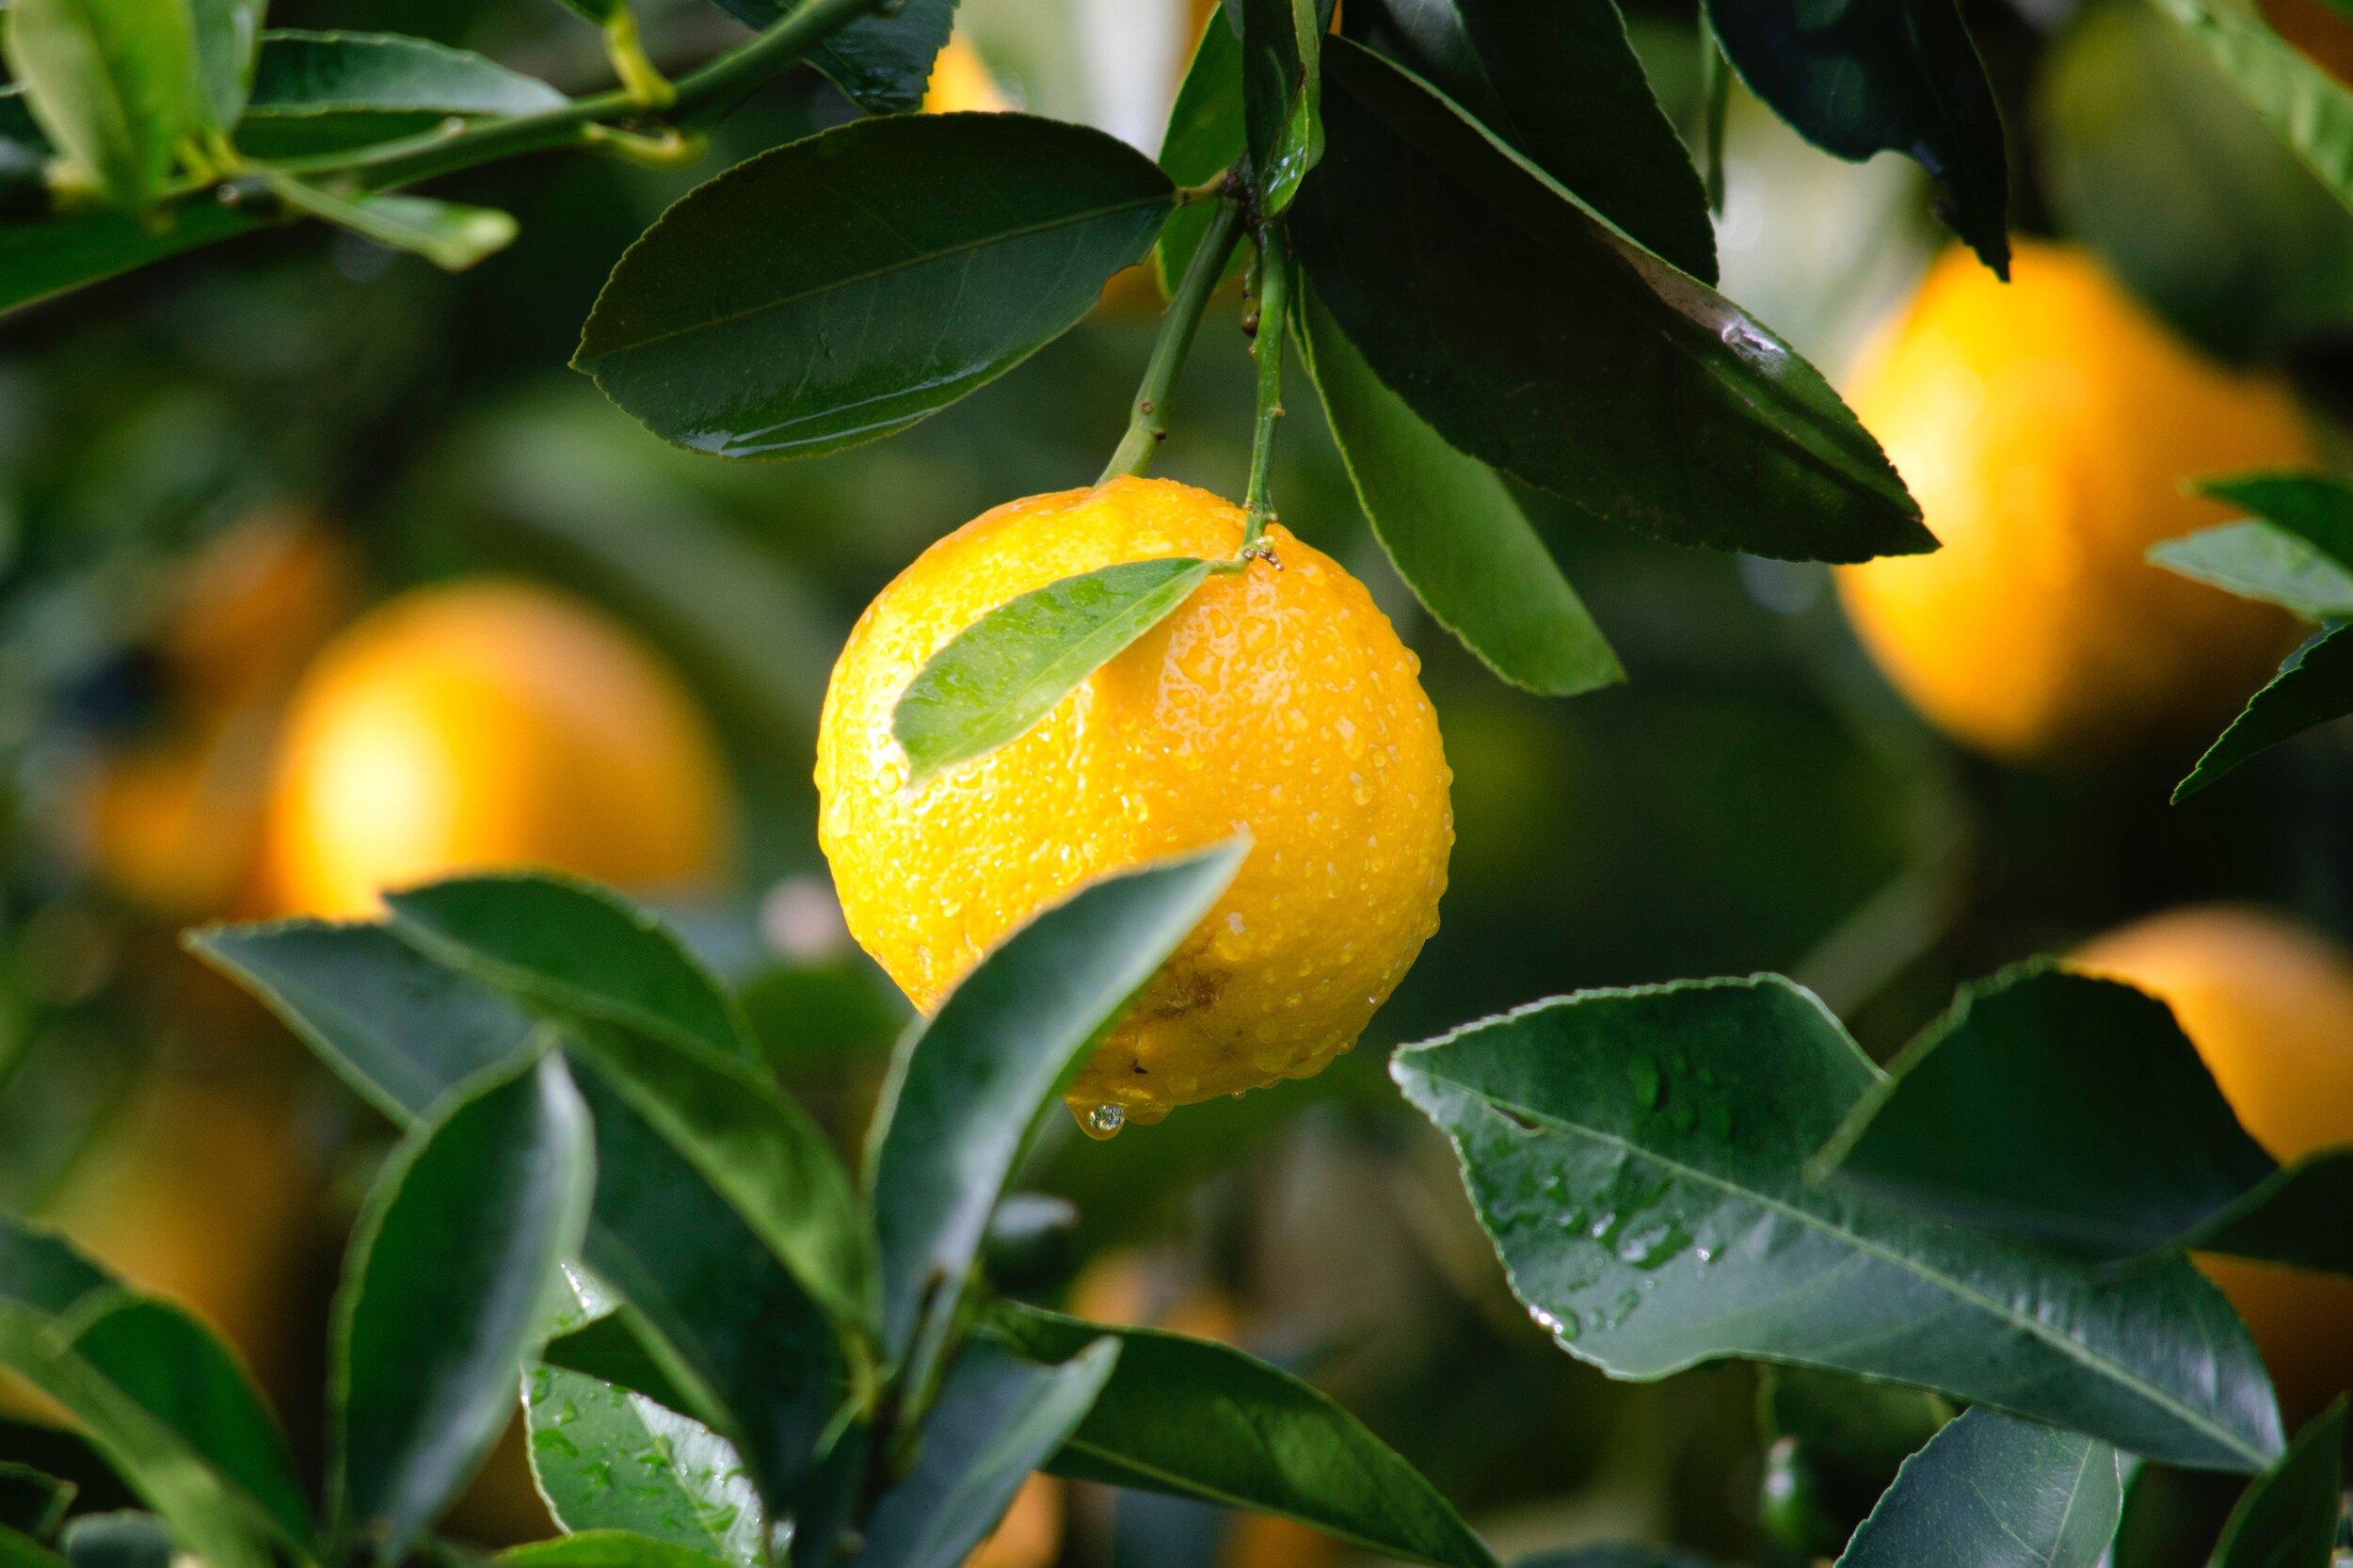 citrus-close-up-crop-129574.jpg